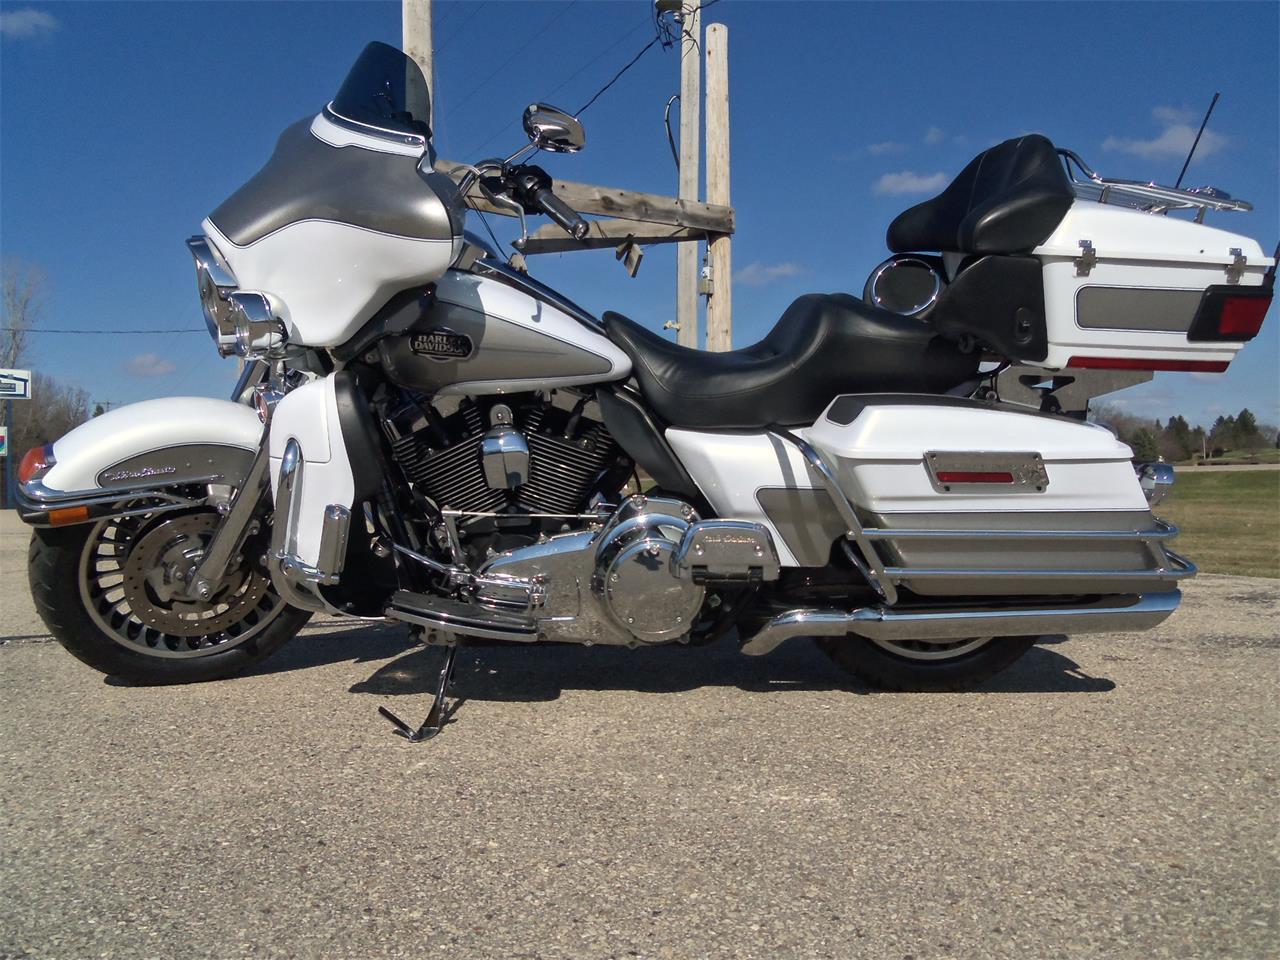 2009 Harley-Davidson Ultra Glide (CC-1337304) for sale in Jefferson, Wisconsin